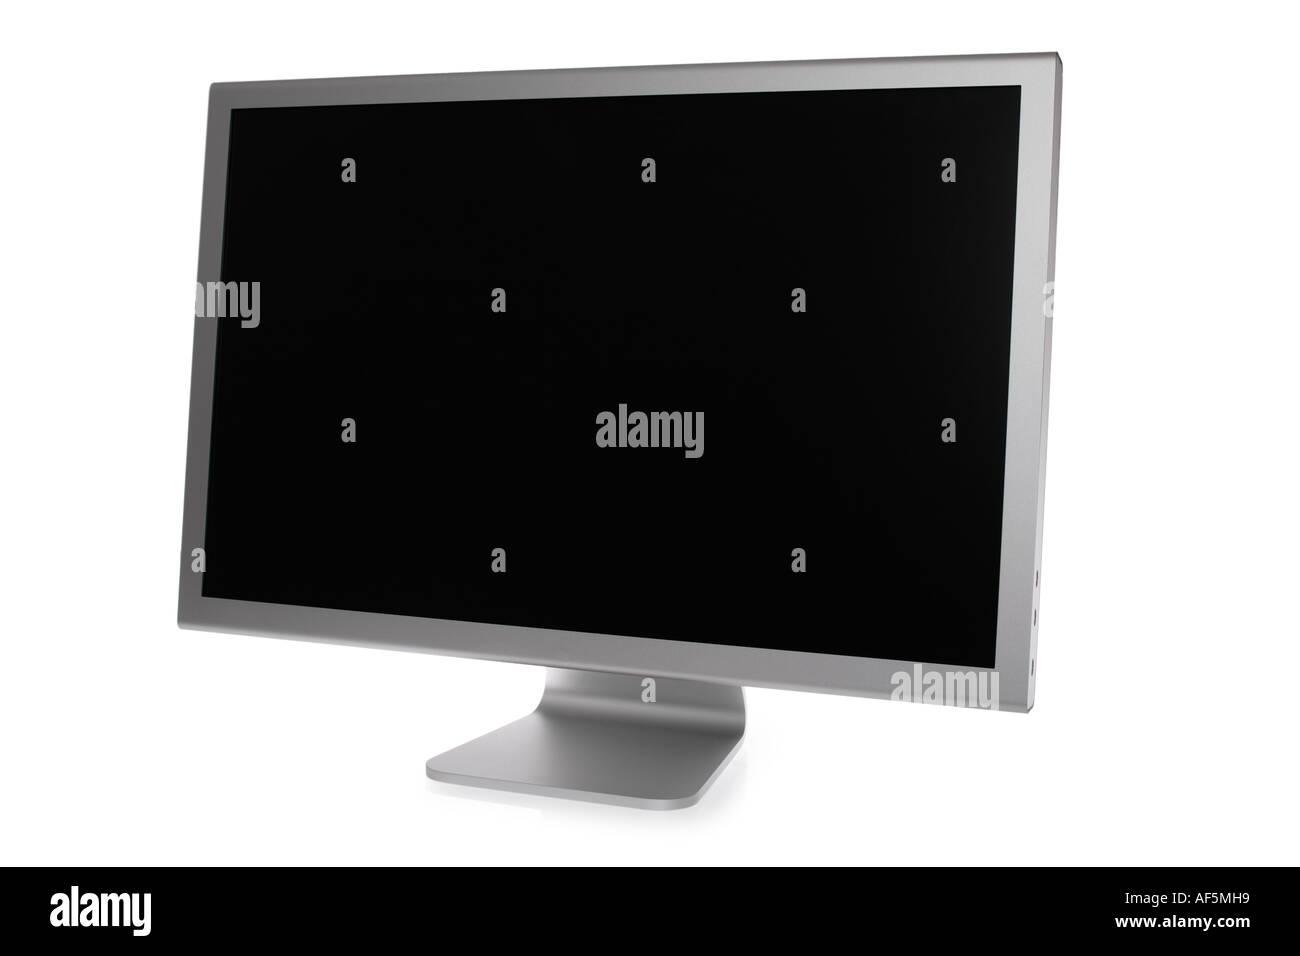 Cinema display computer monitor - Stock Image